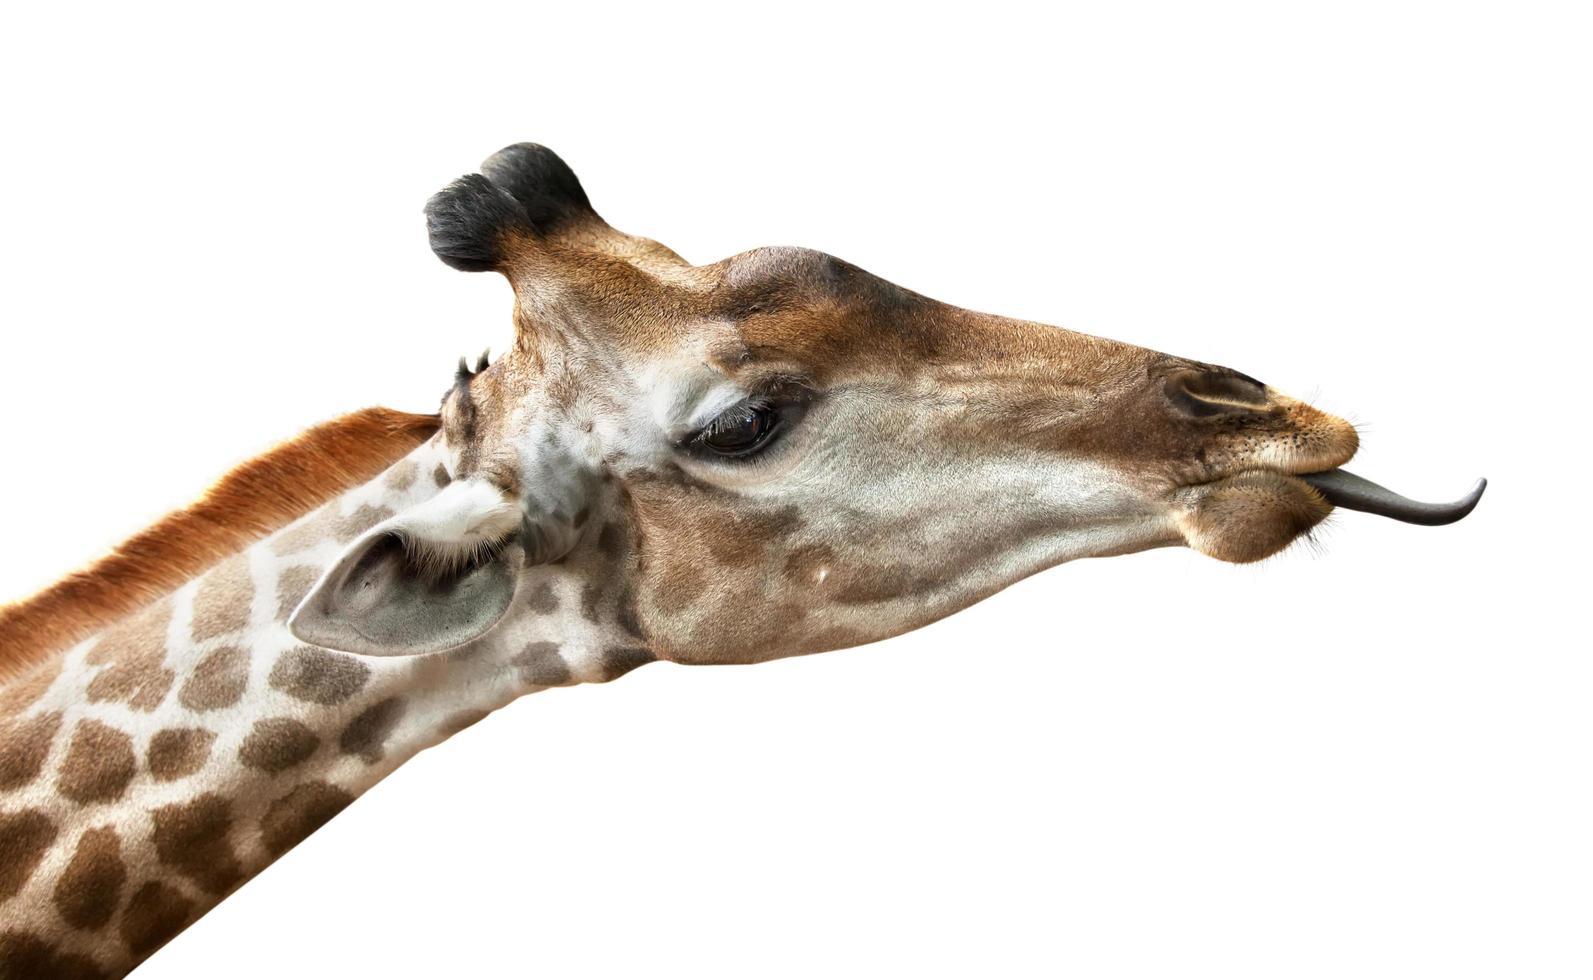 girafe sur fond blanc photo